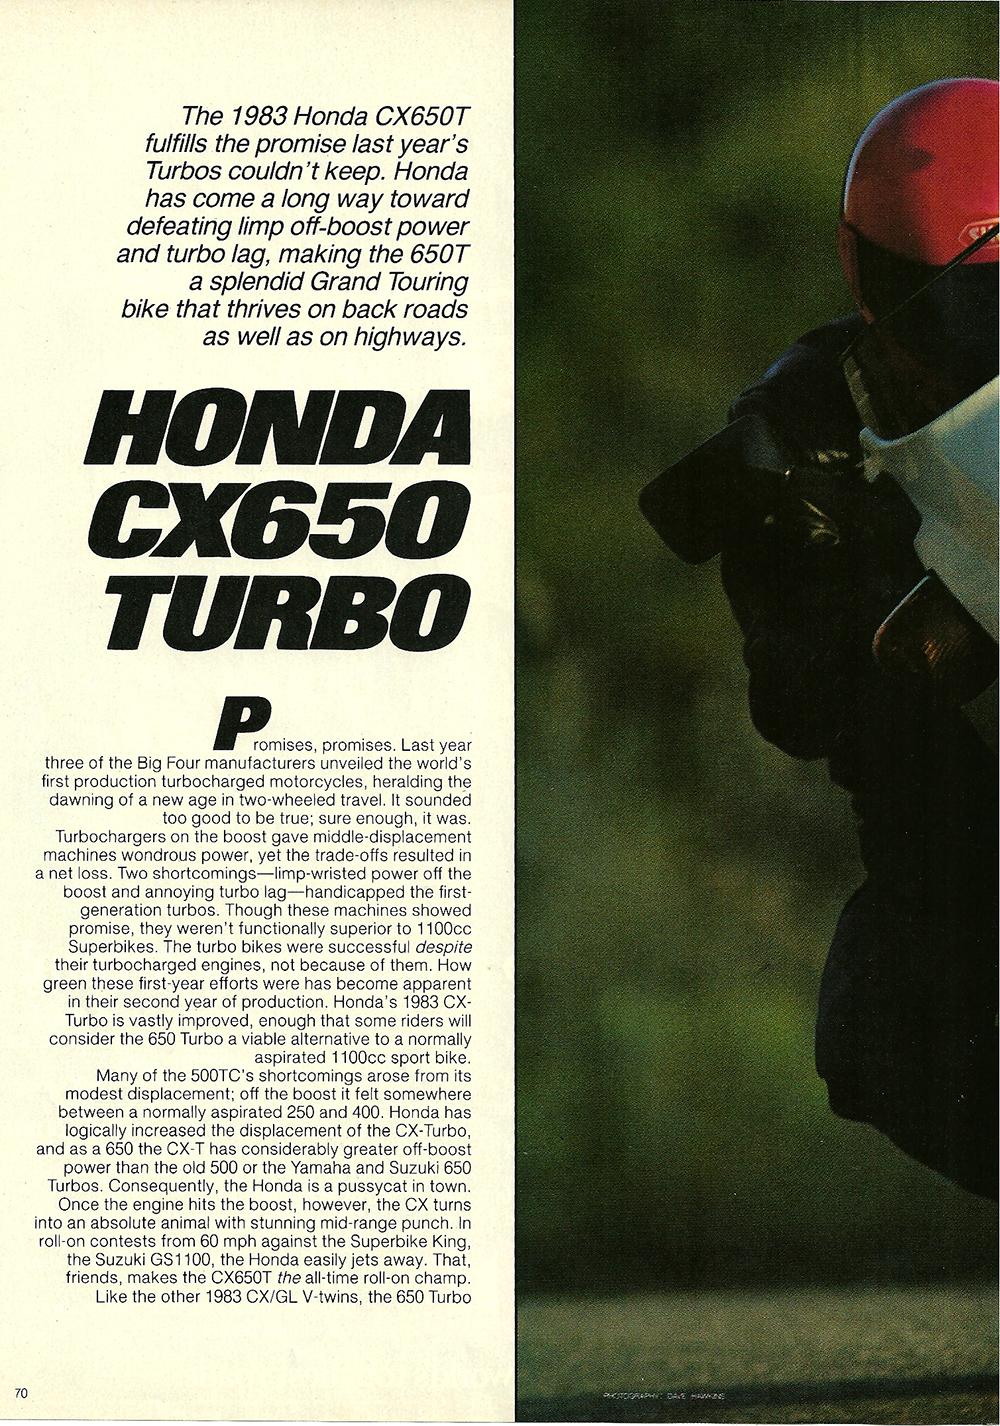 1983 Honda CX650 turbo road test 1.jpg